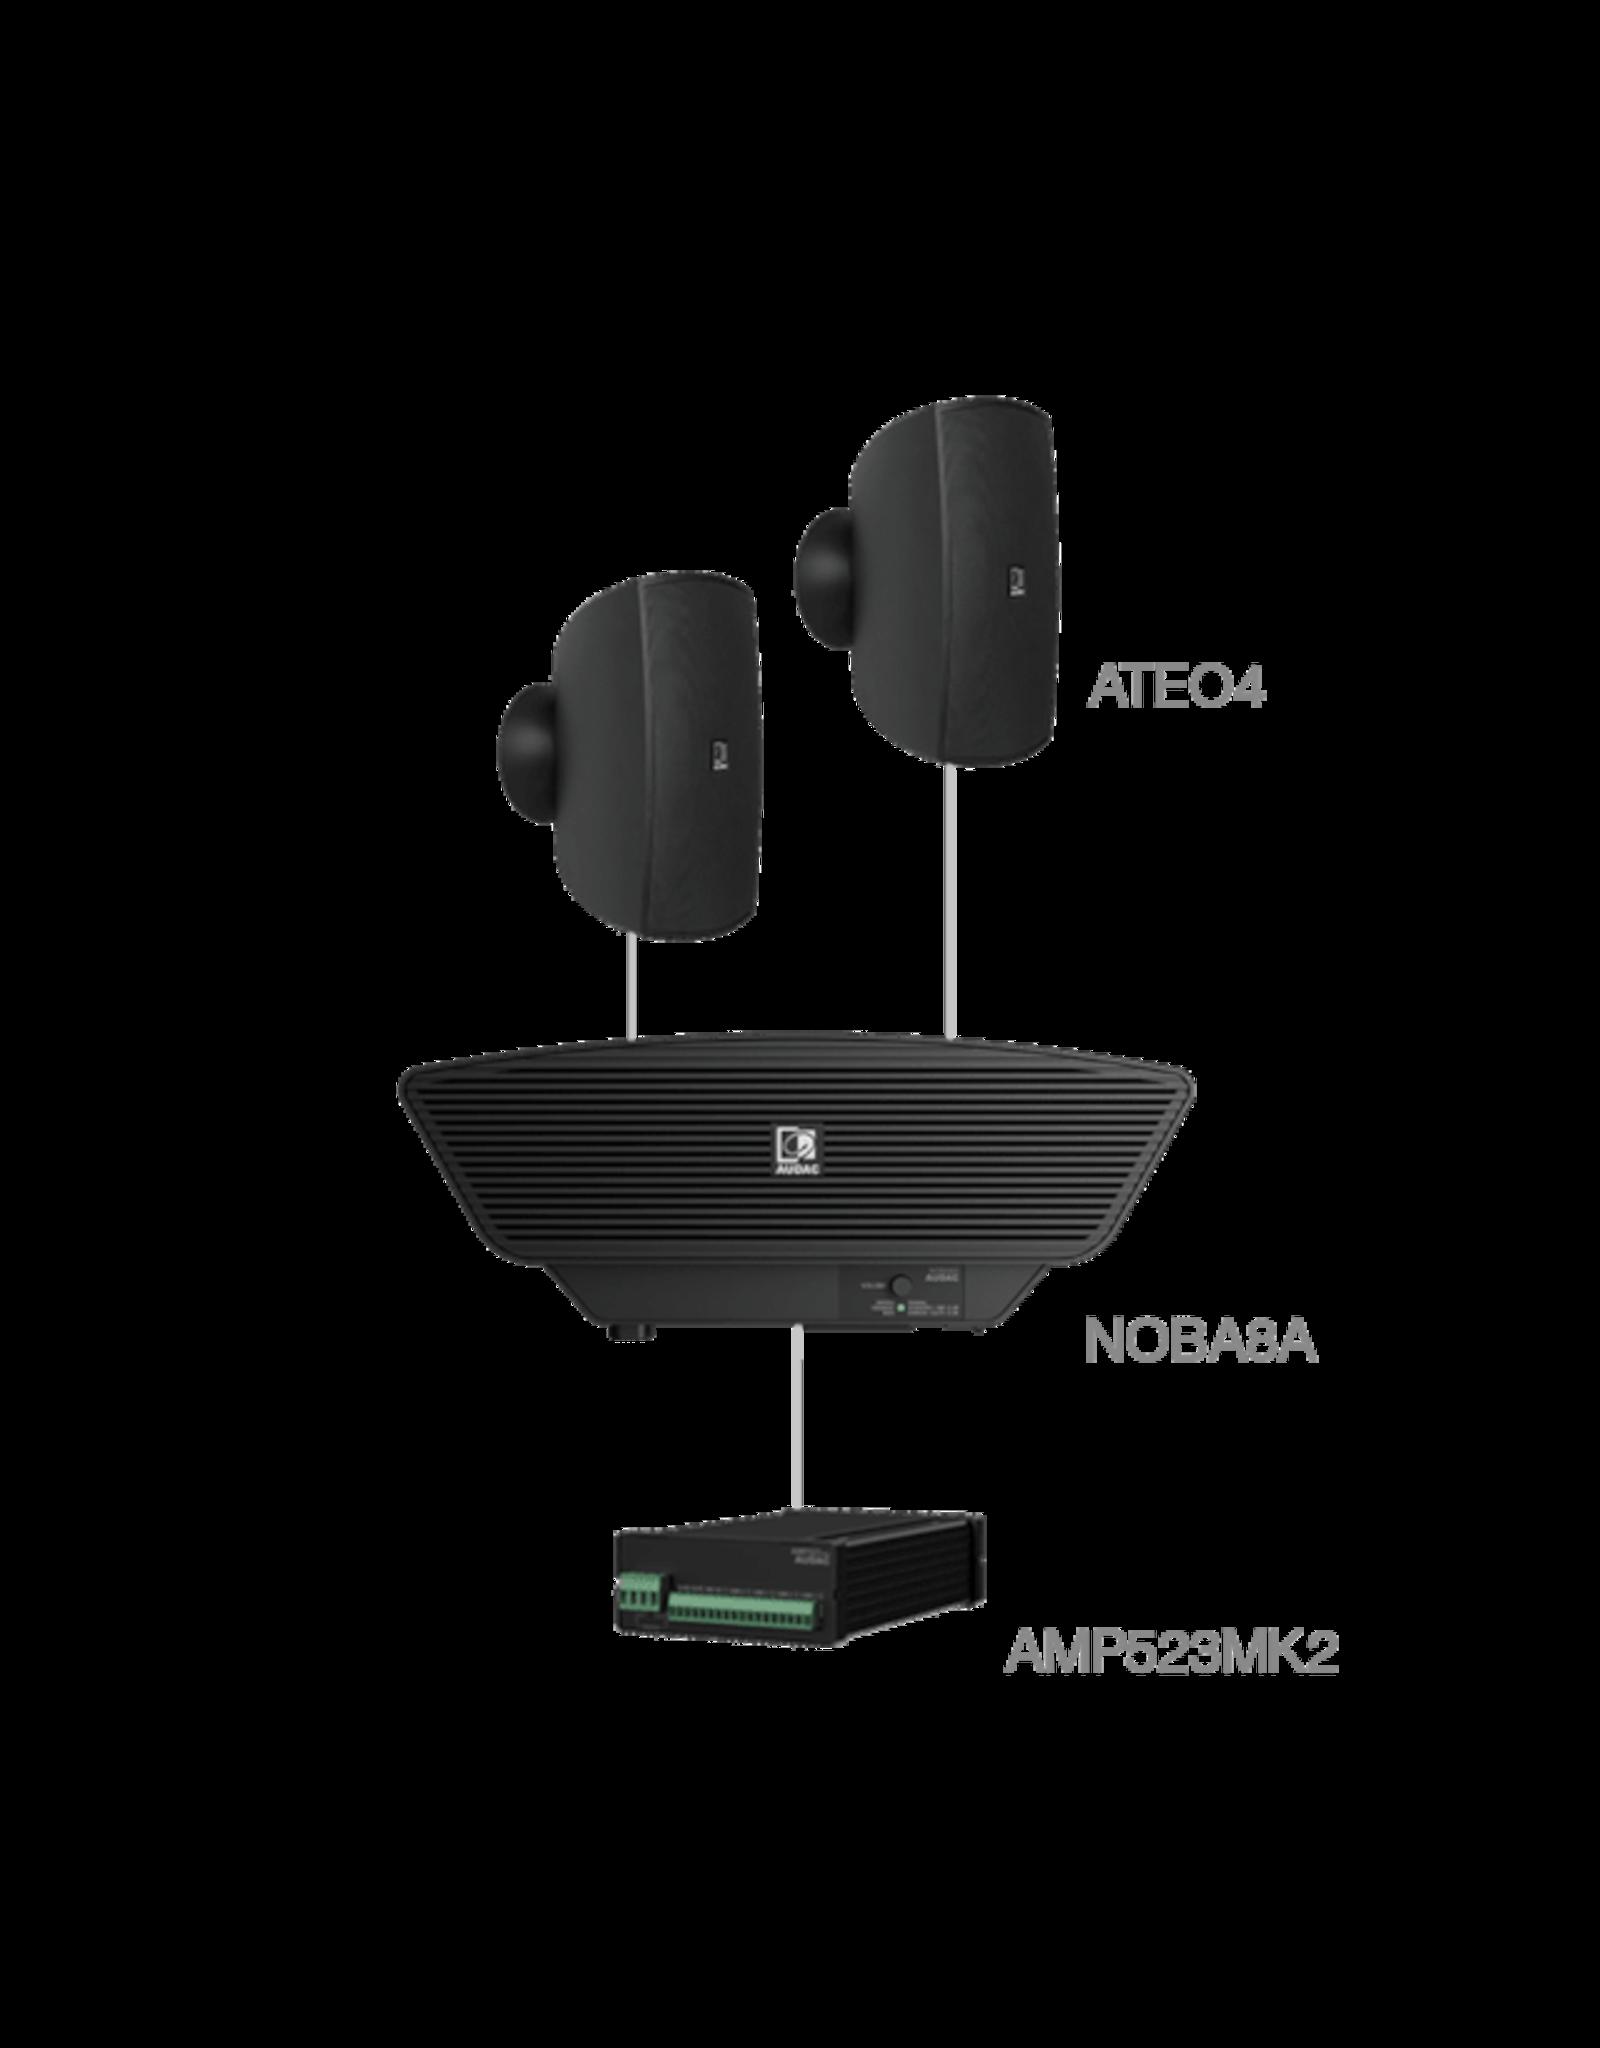 Audac 2 x ATEO4 + NOBA8A + AMP523MK2 Black